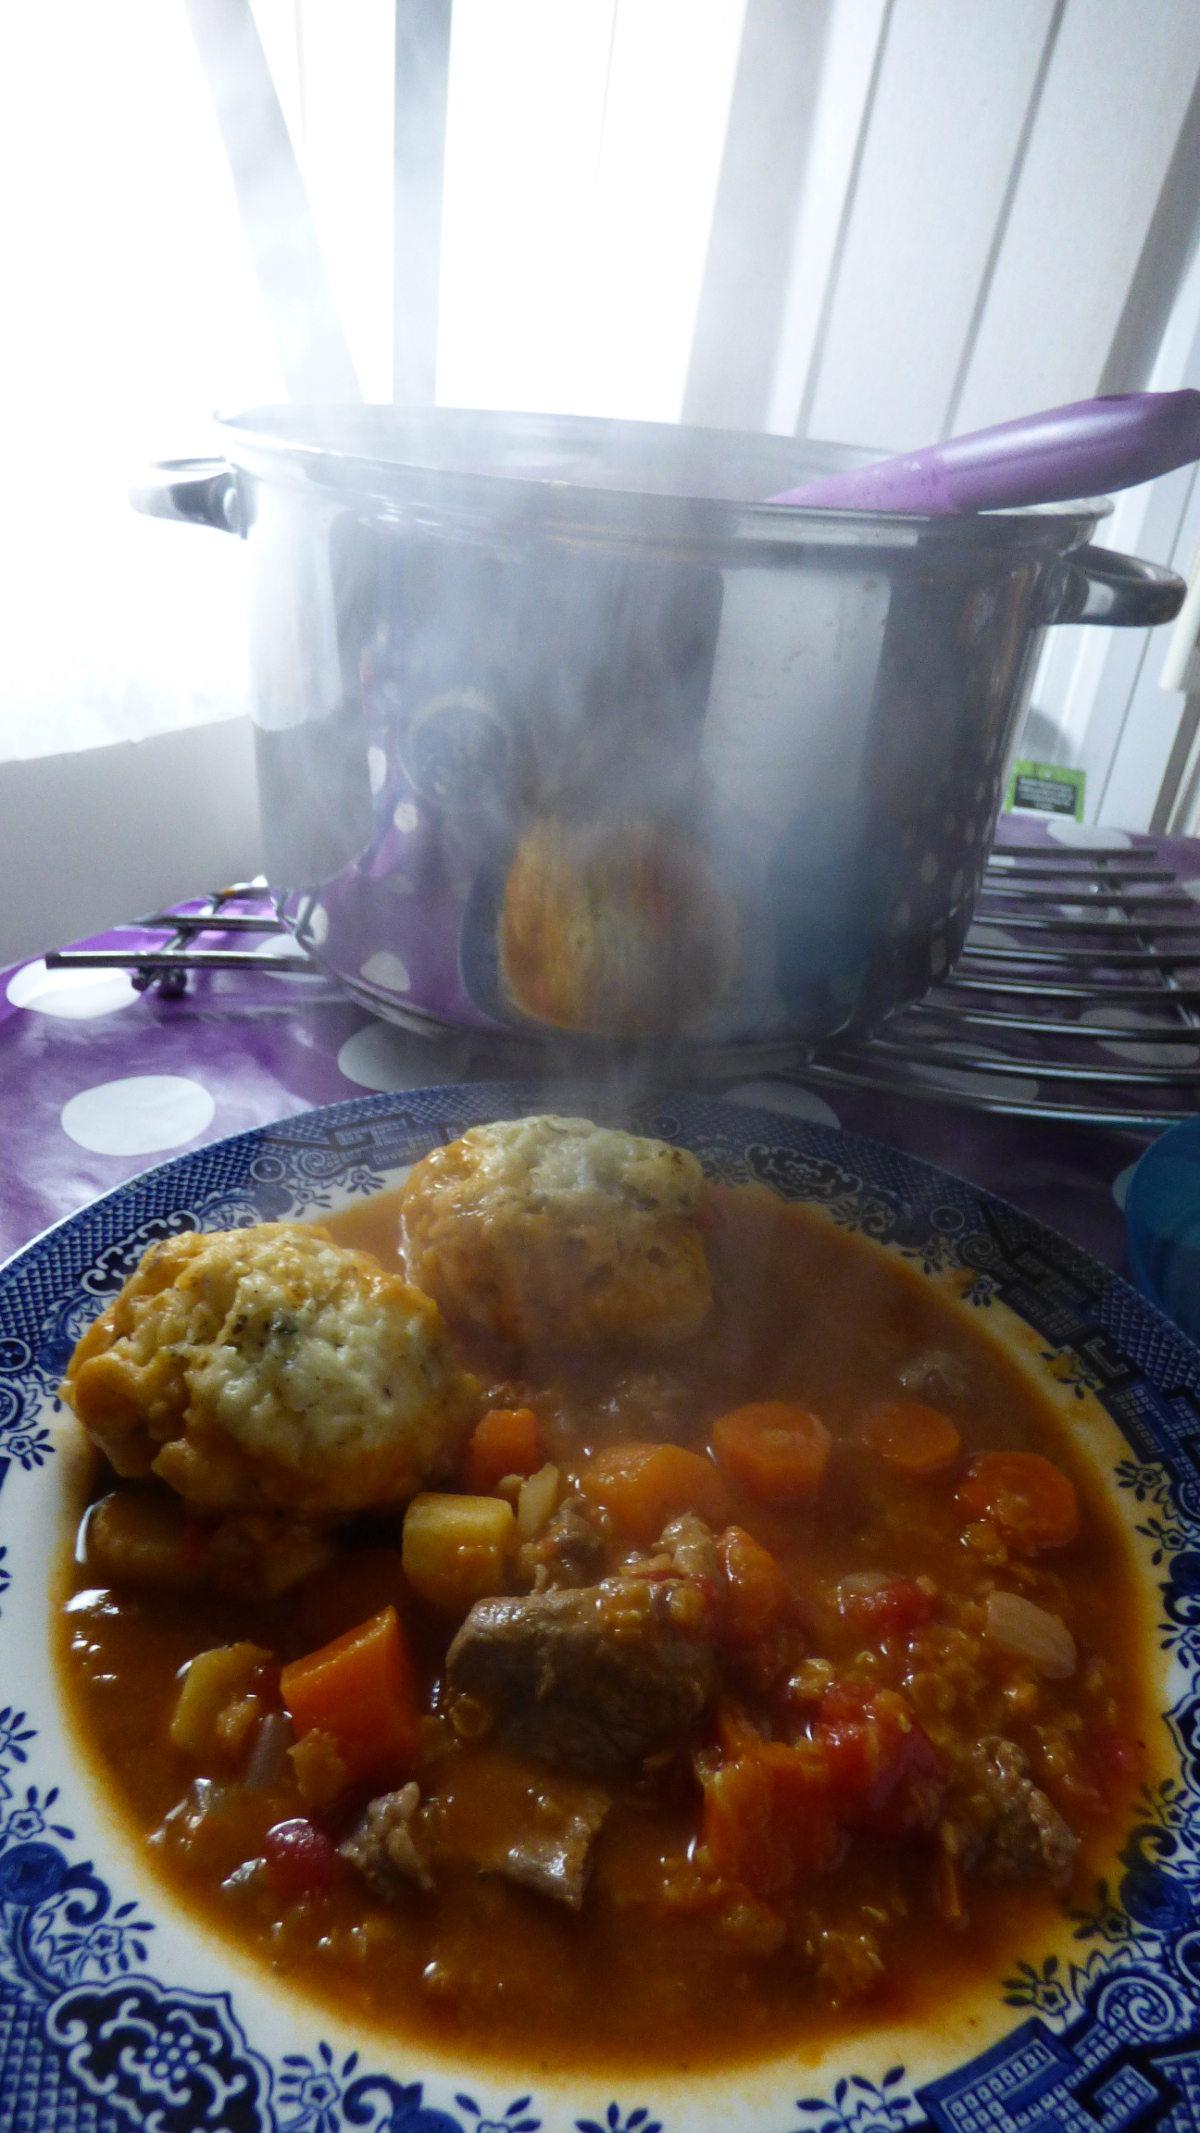 Lamb, Lentil, Lemon and Cumin Stew with Herby Dumplings